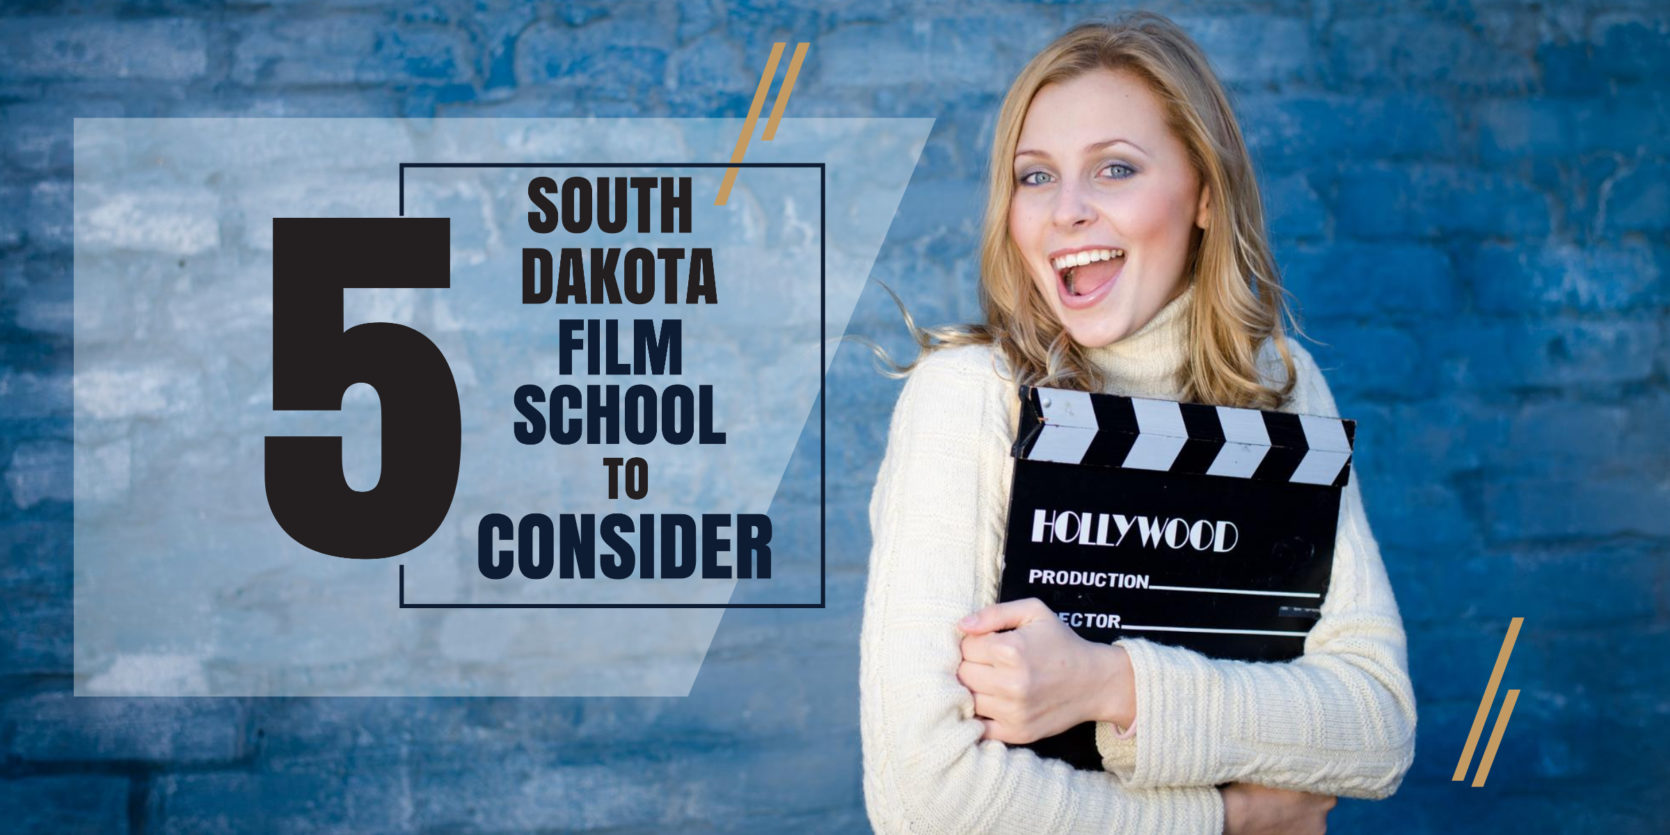 Top 5 South Dakota film schools